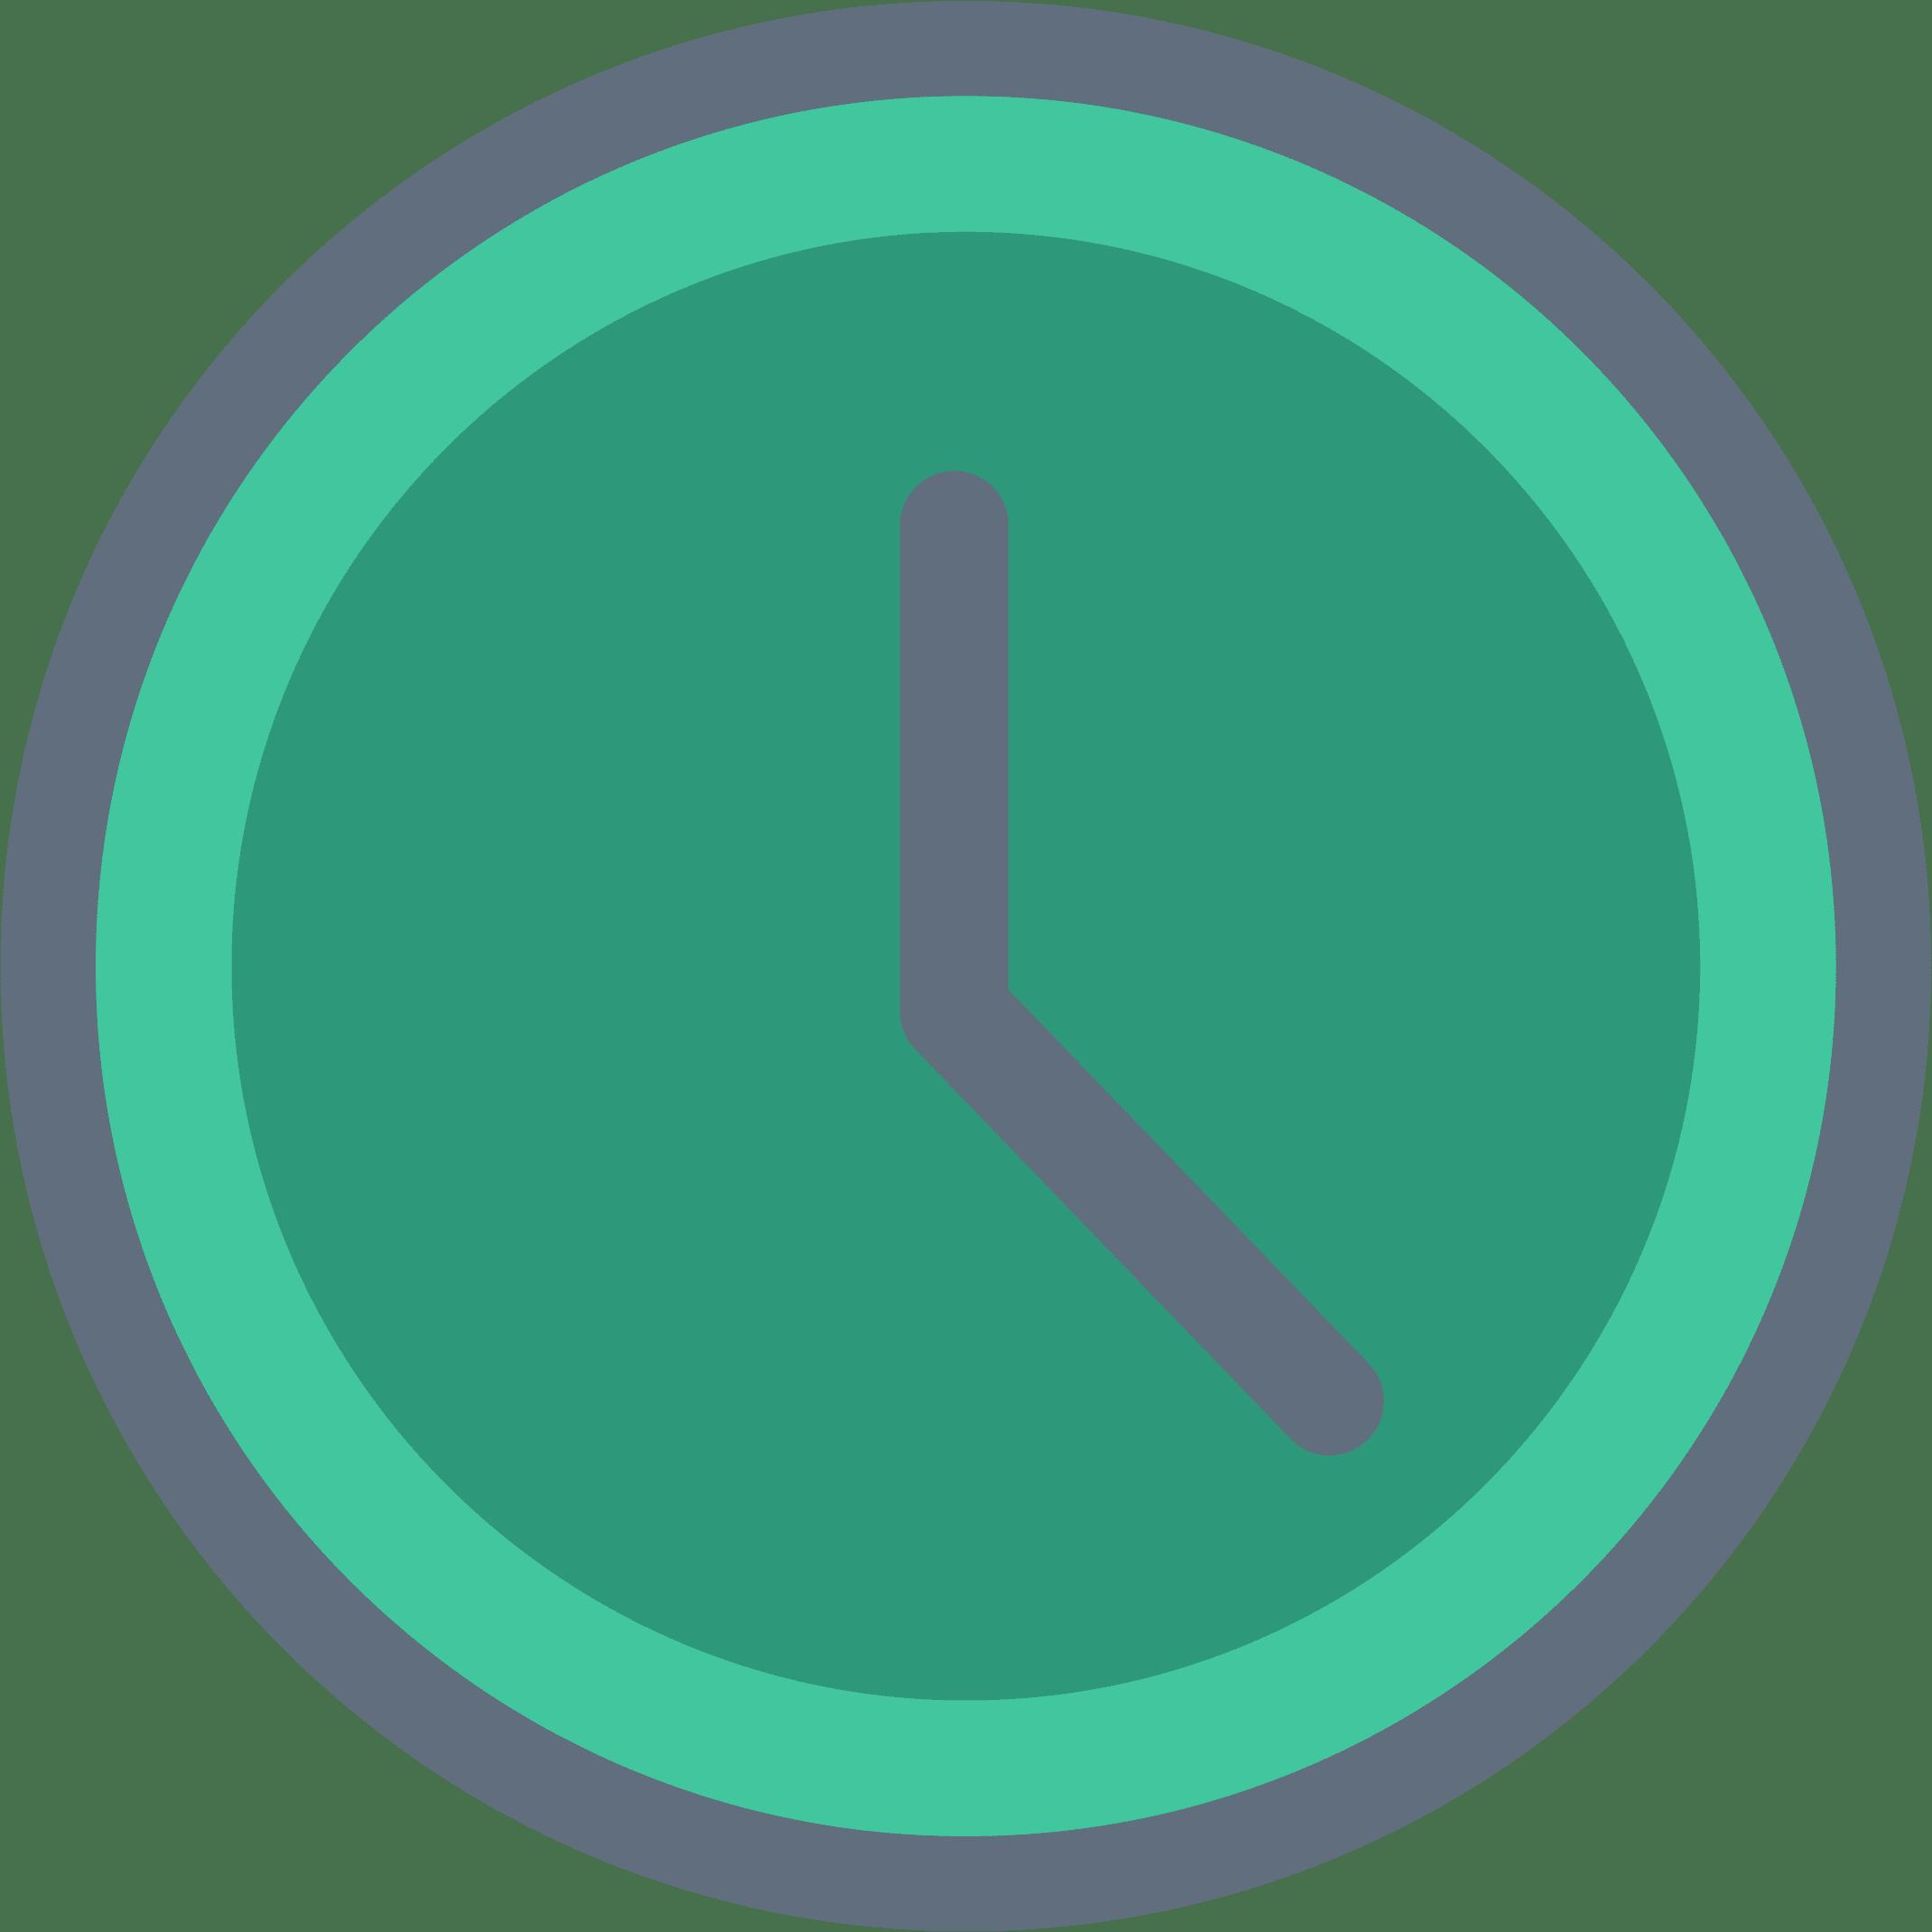 clock_sla_managed_service